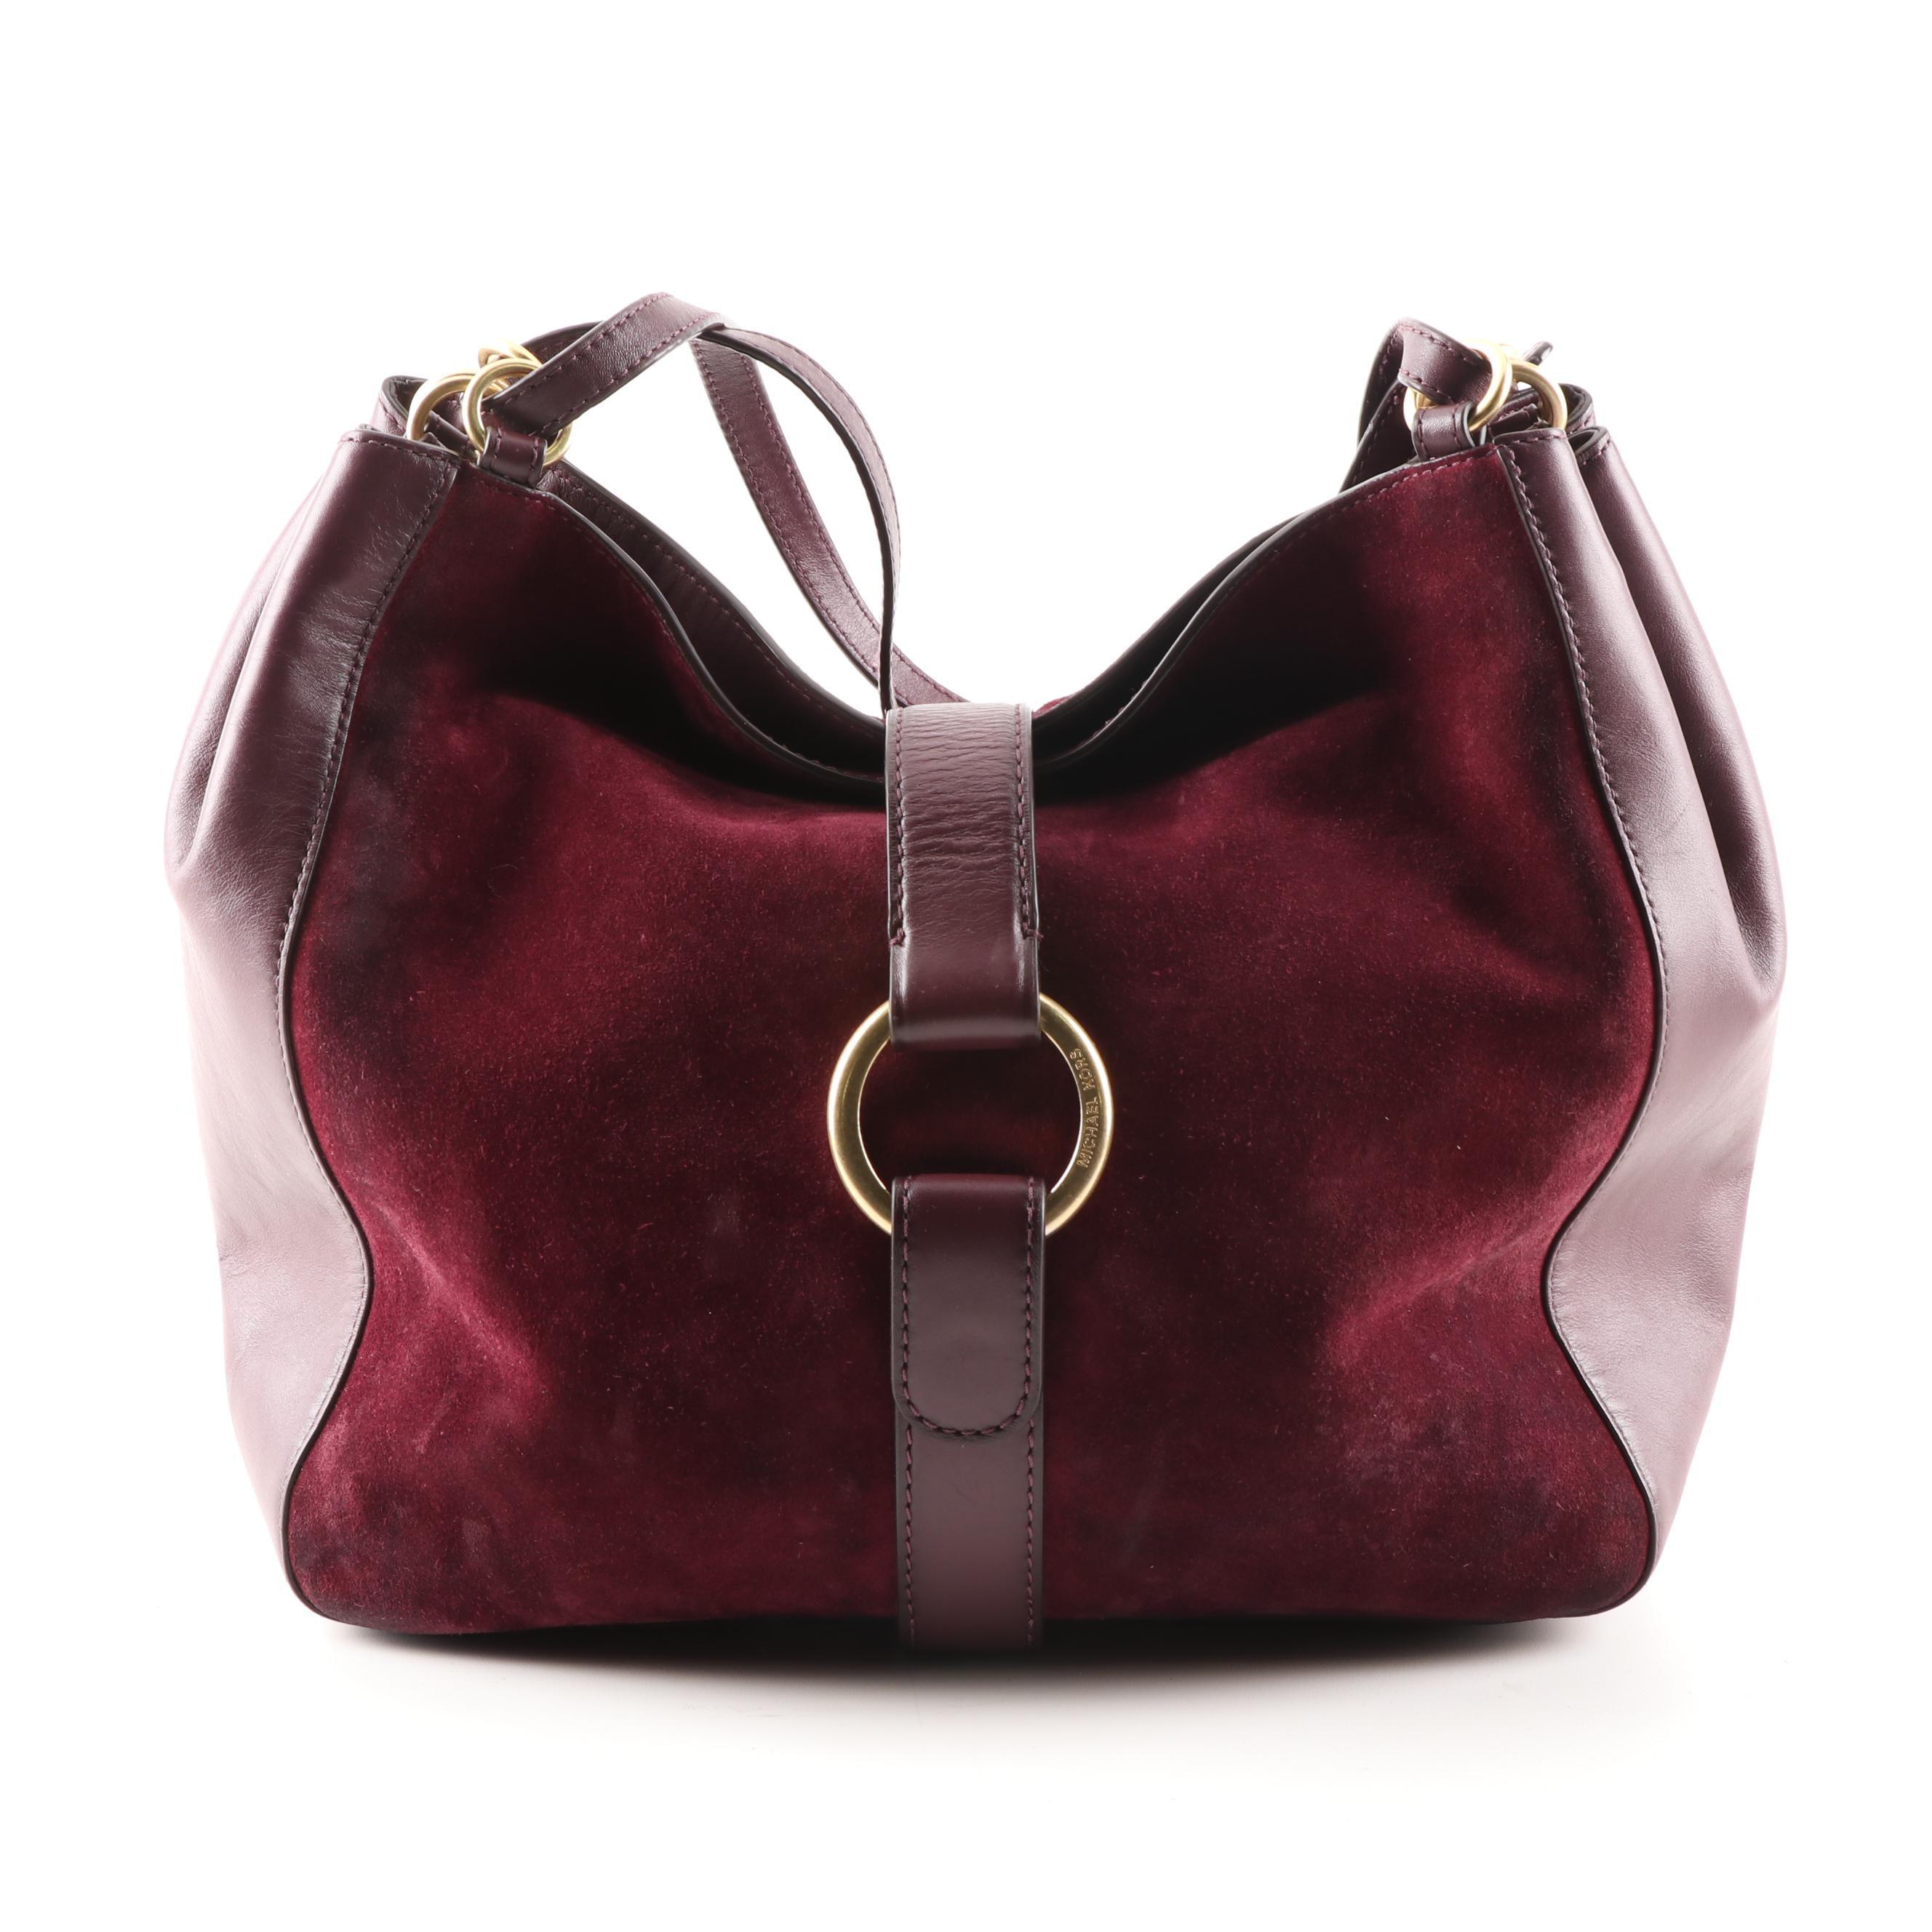 MICHAEL KORS Michael Kors Merlot Leather and Suede Hobo Bag